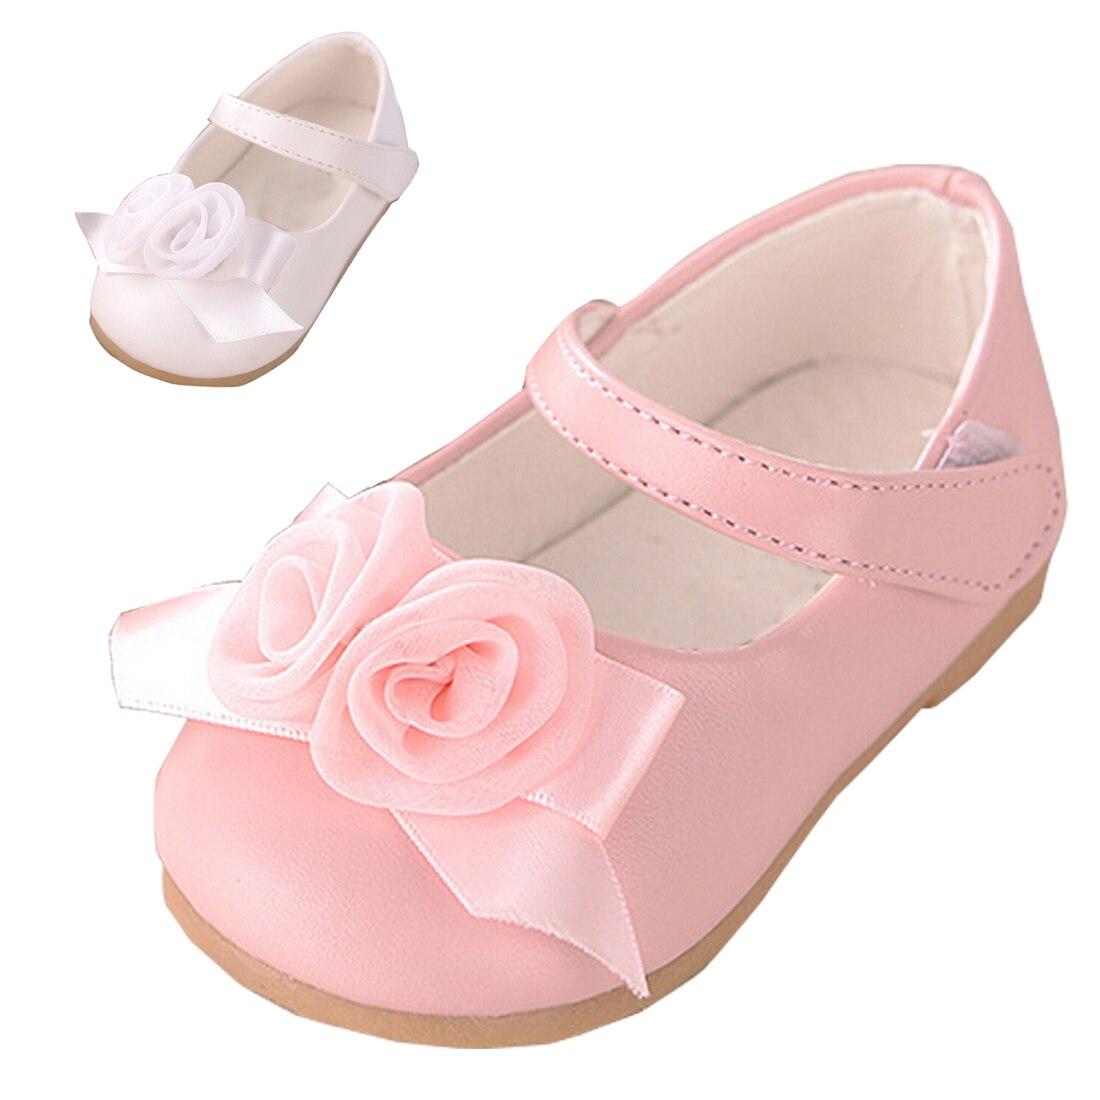 Aliexpress Buy Baby Kids Shoes Cute Pink Flowers Girls Shoes